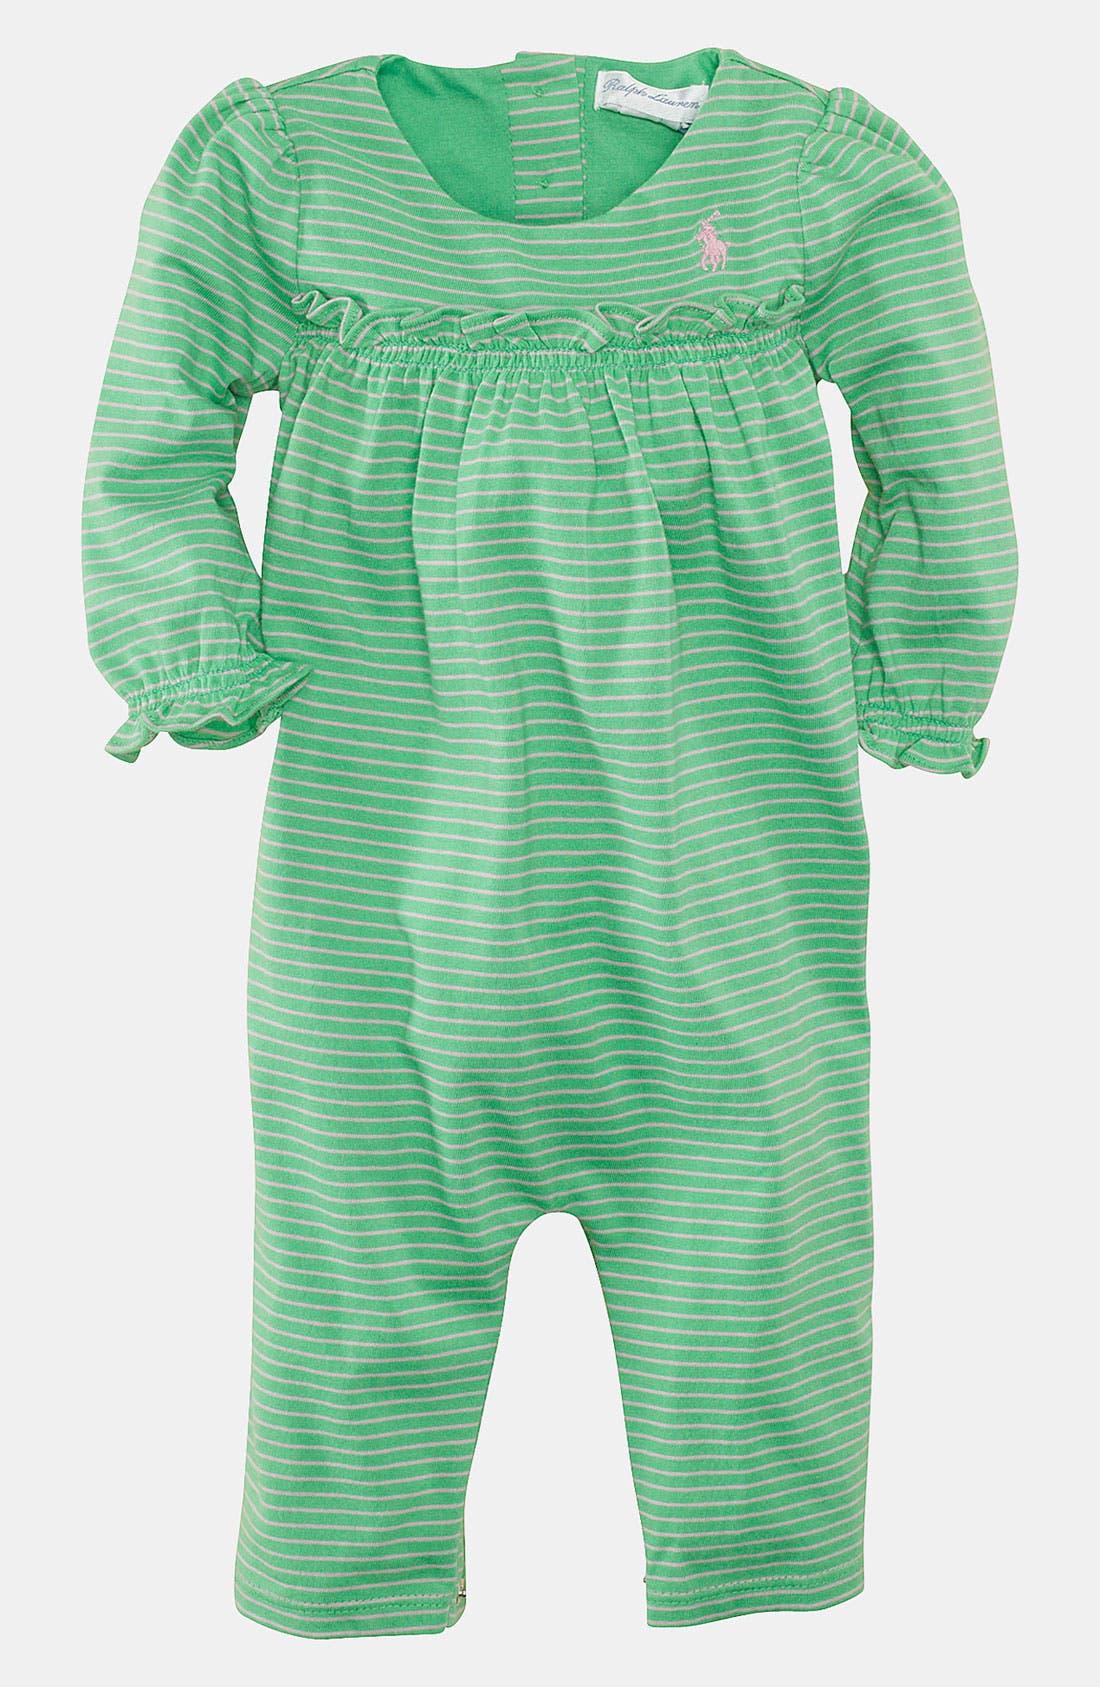 Alternate Image 1 Selected - Ralph Lauren Stripe Coveralls (Infant)